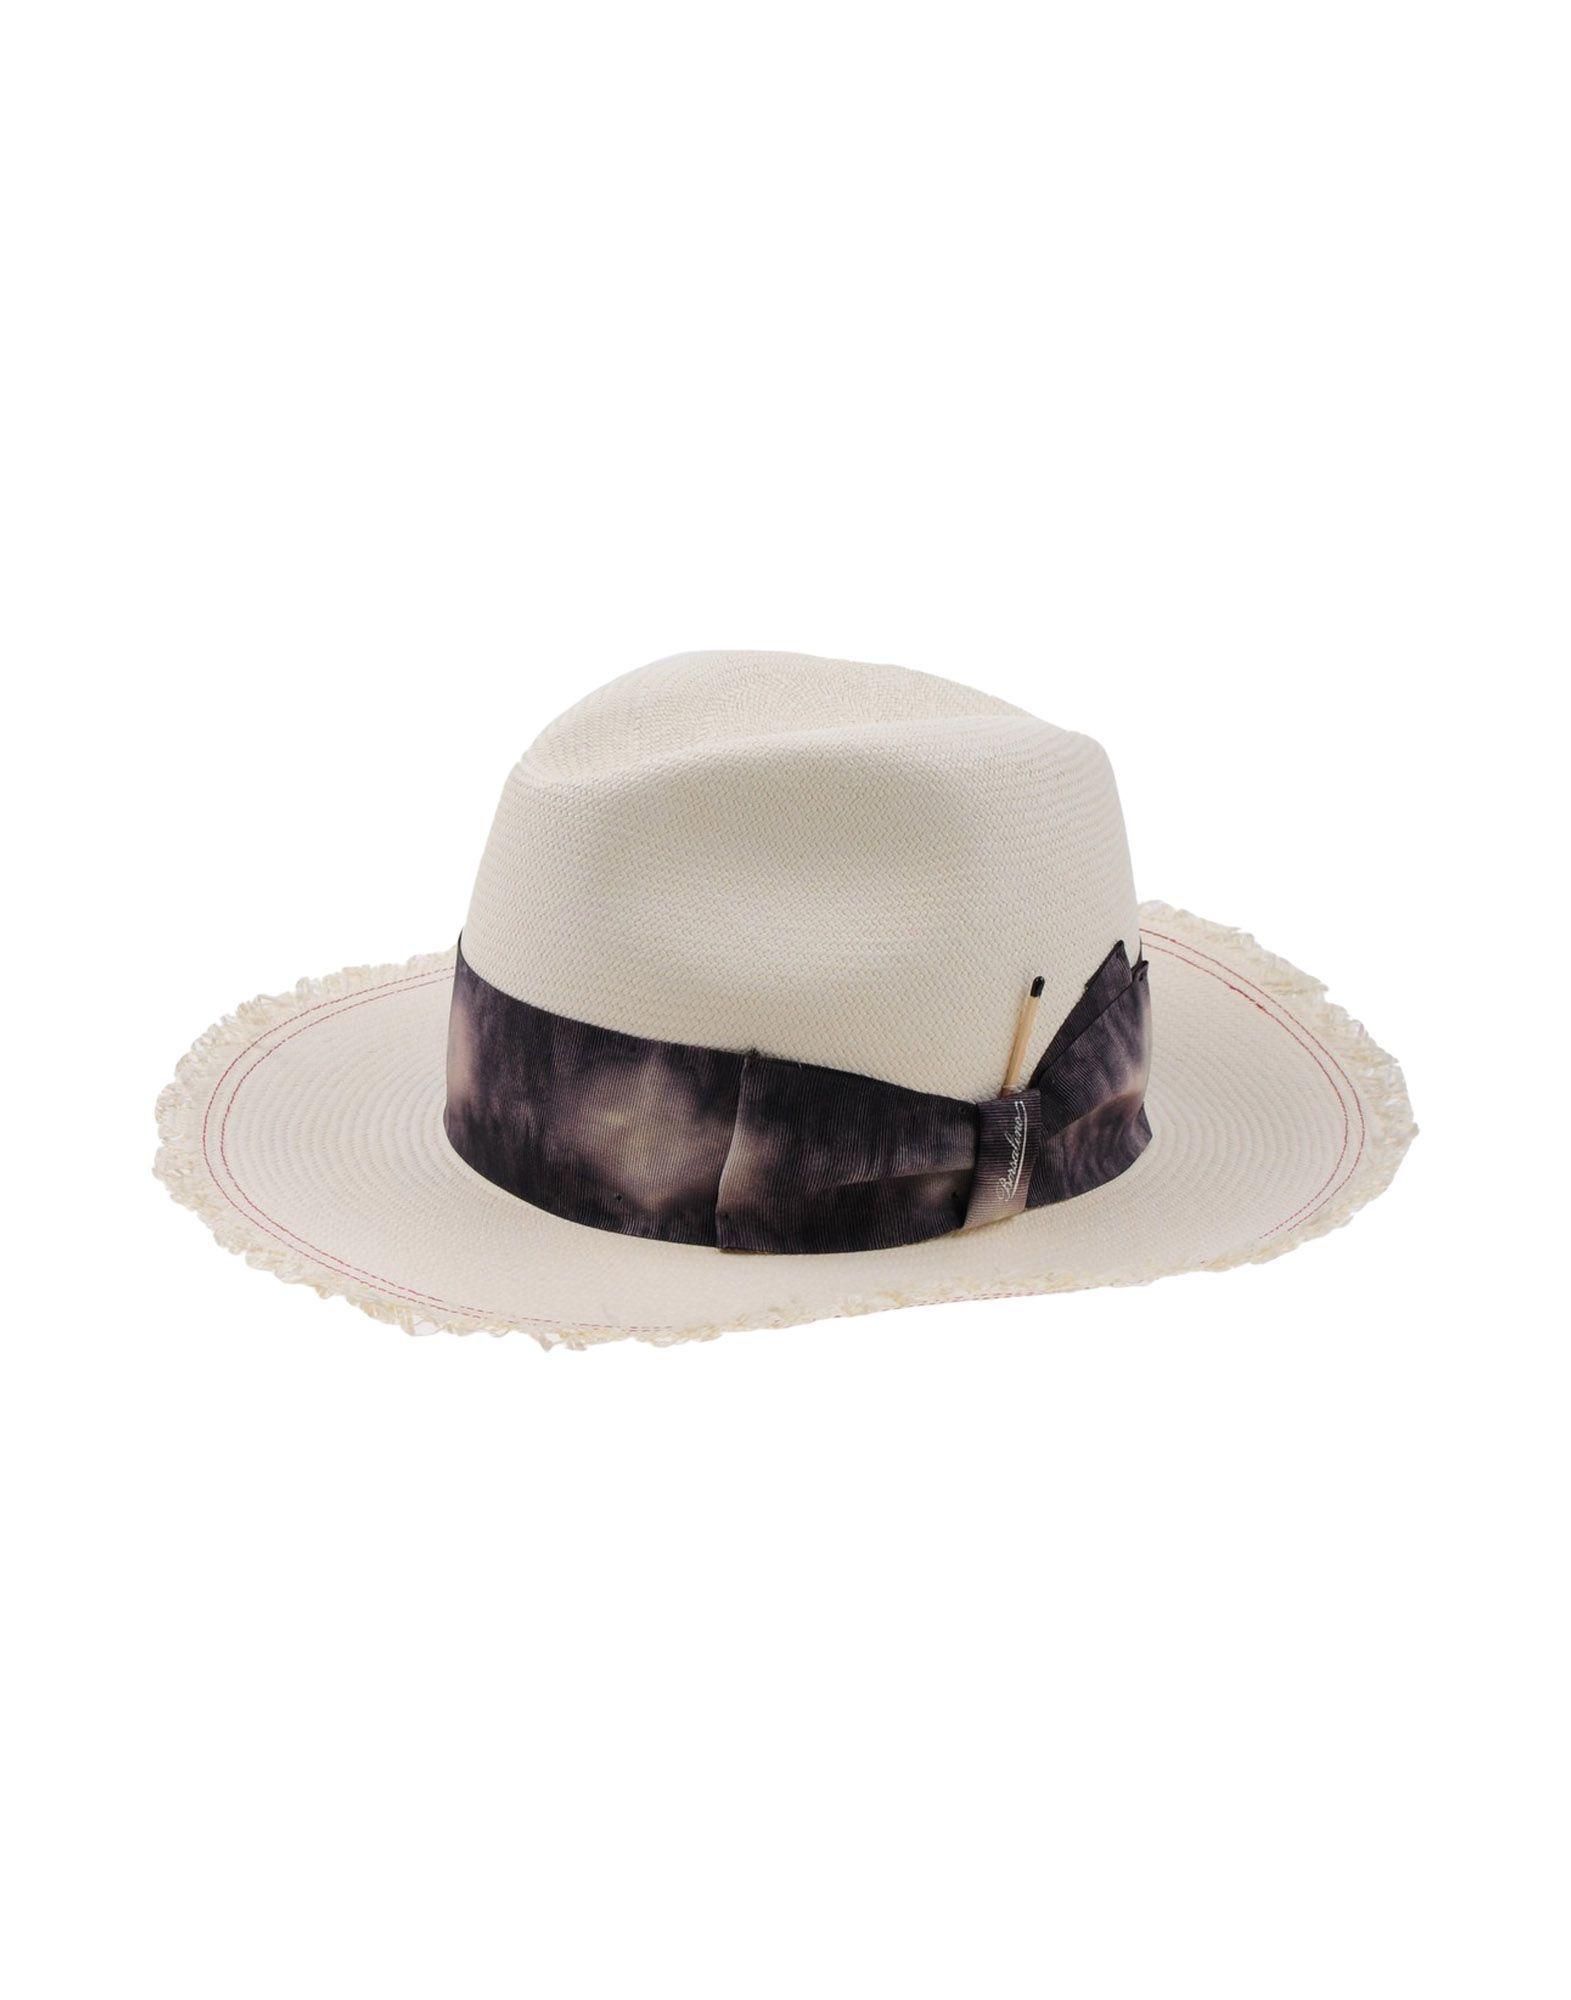 dbc43ff4aa6  borsalino   Borsalino Hats